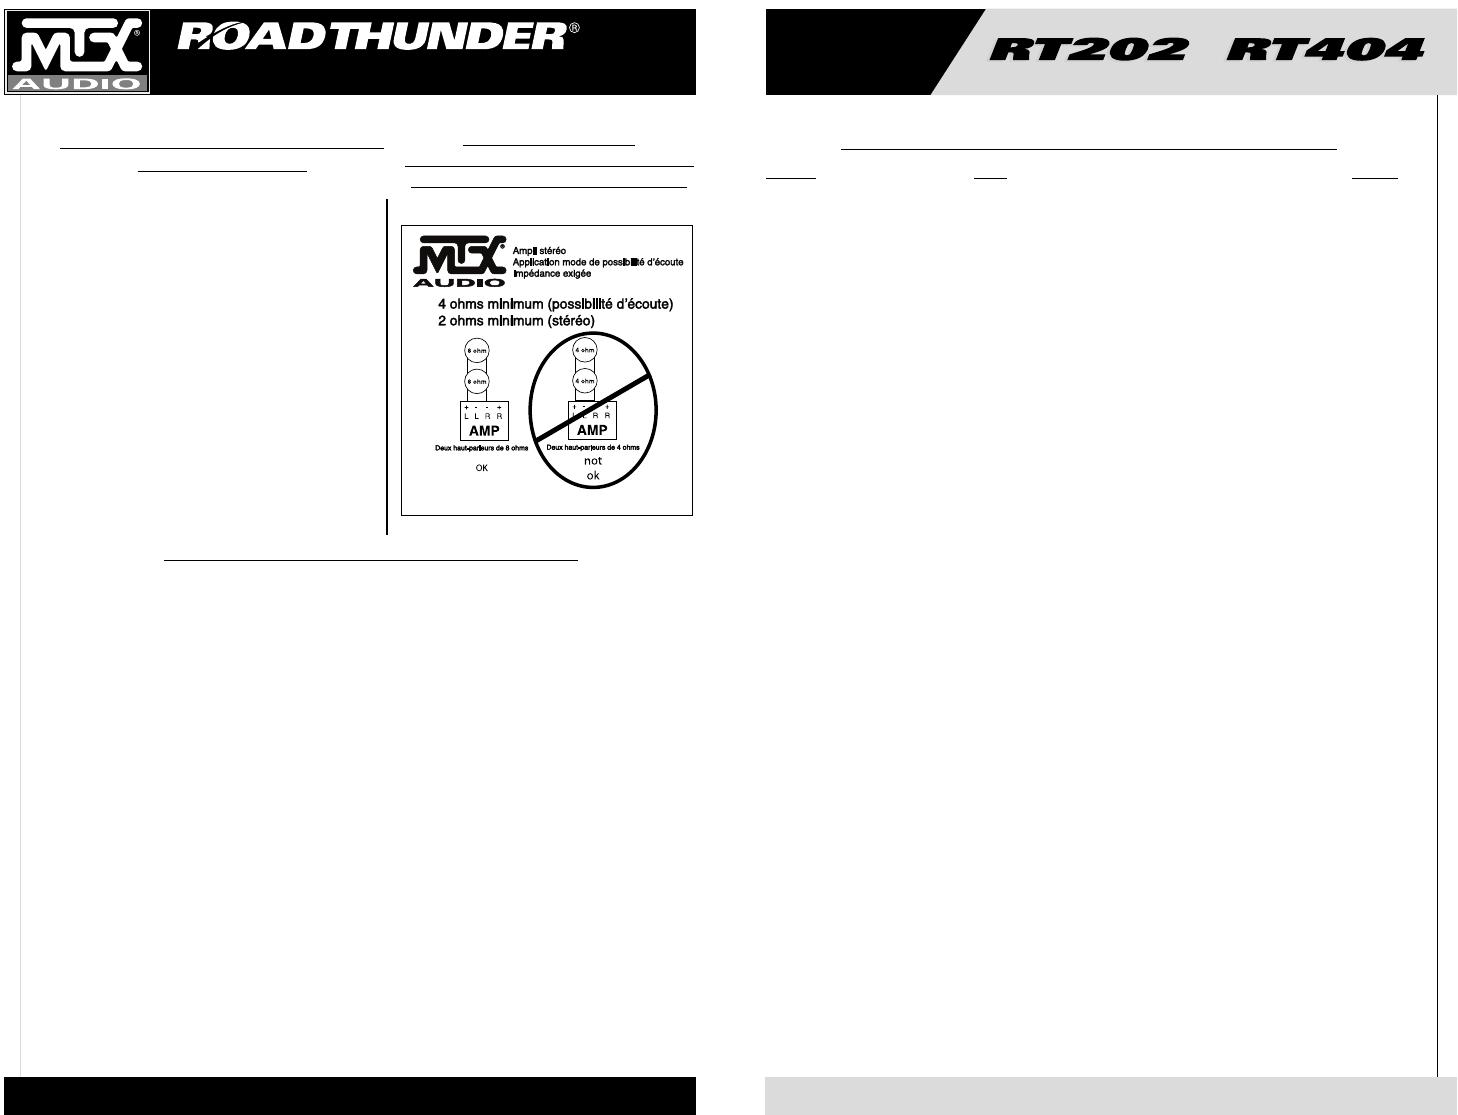 Handleiding Mtx Rt202 Rt404 Pagina 13 Van 19 English Amp Wiring Diagram